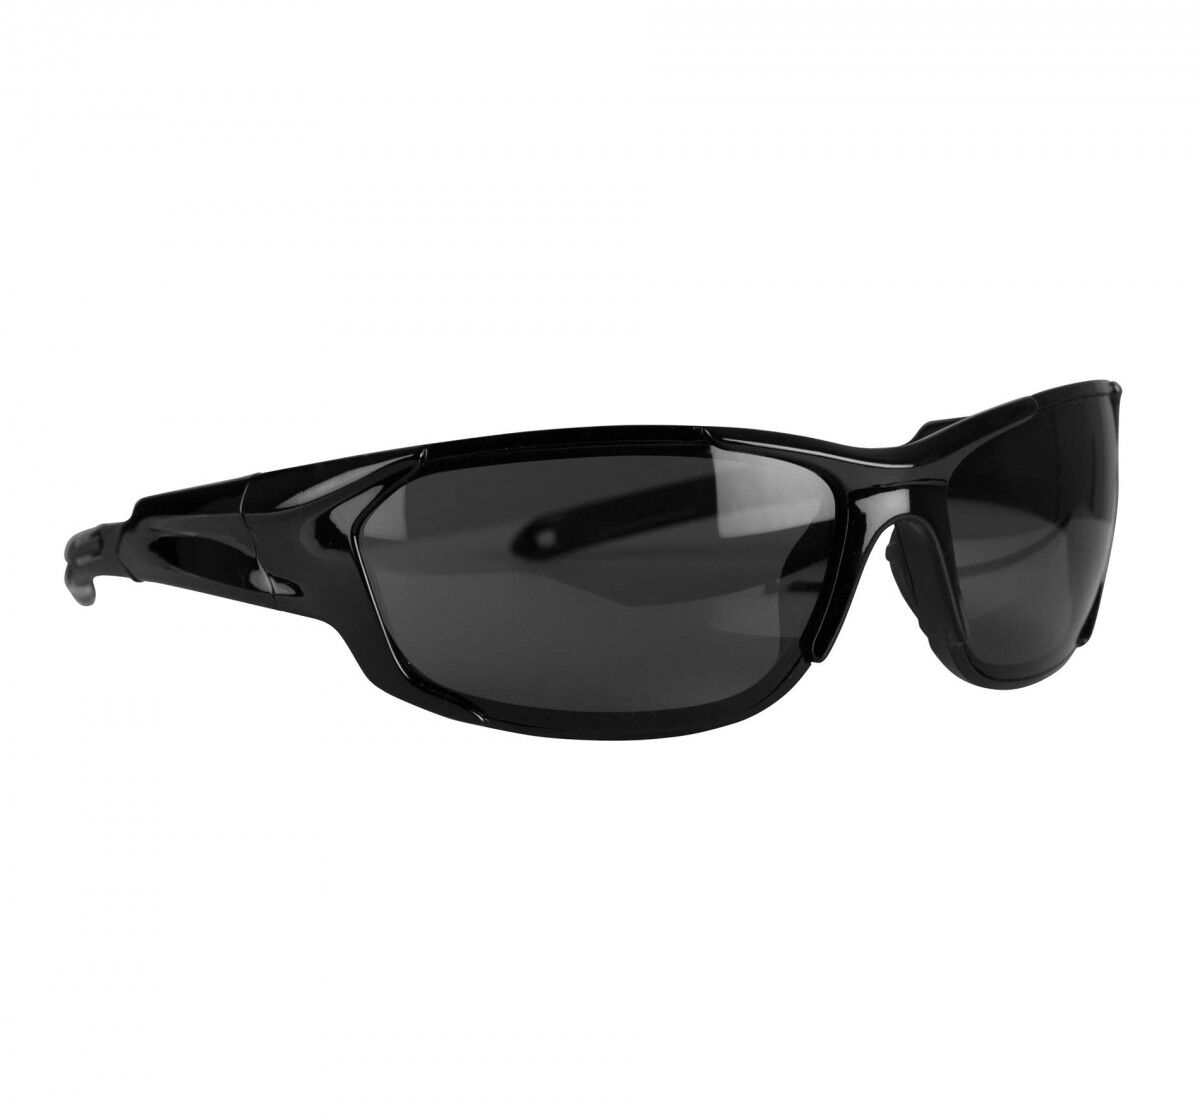 lunettes de soleil sport ki3031 noir kimood. Black Bedroom Furniture Sets. Home Design Ideas